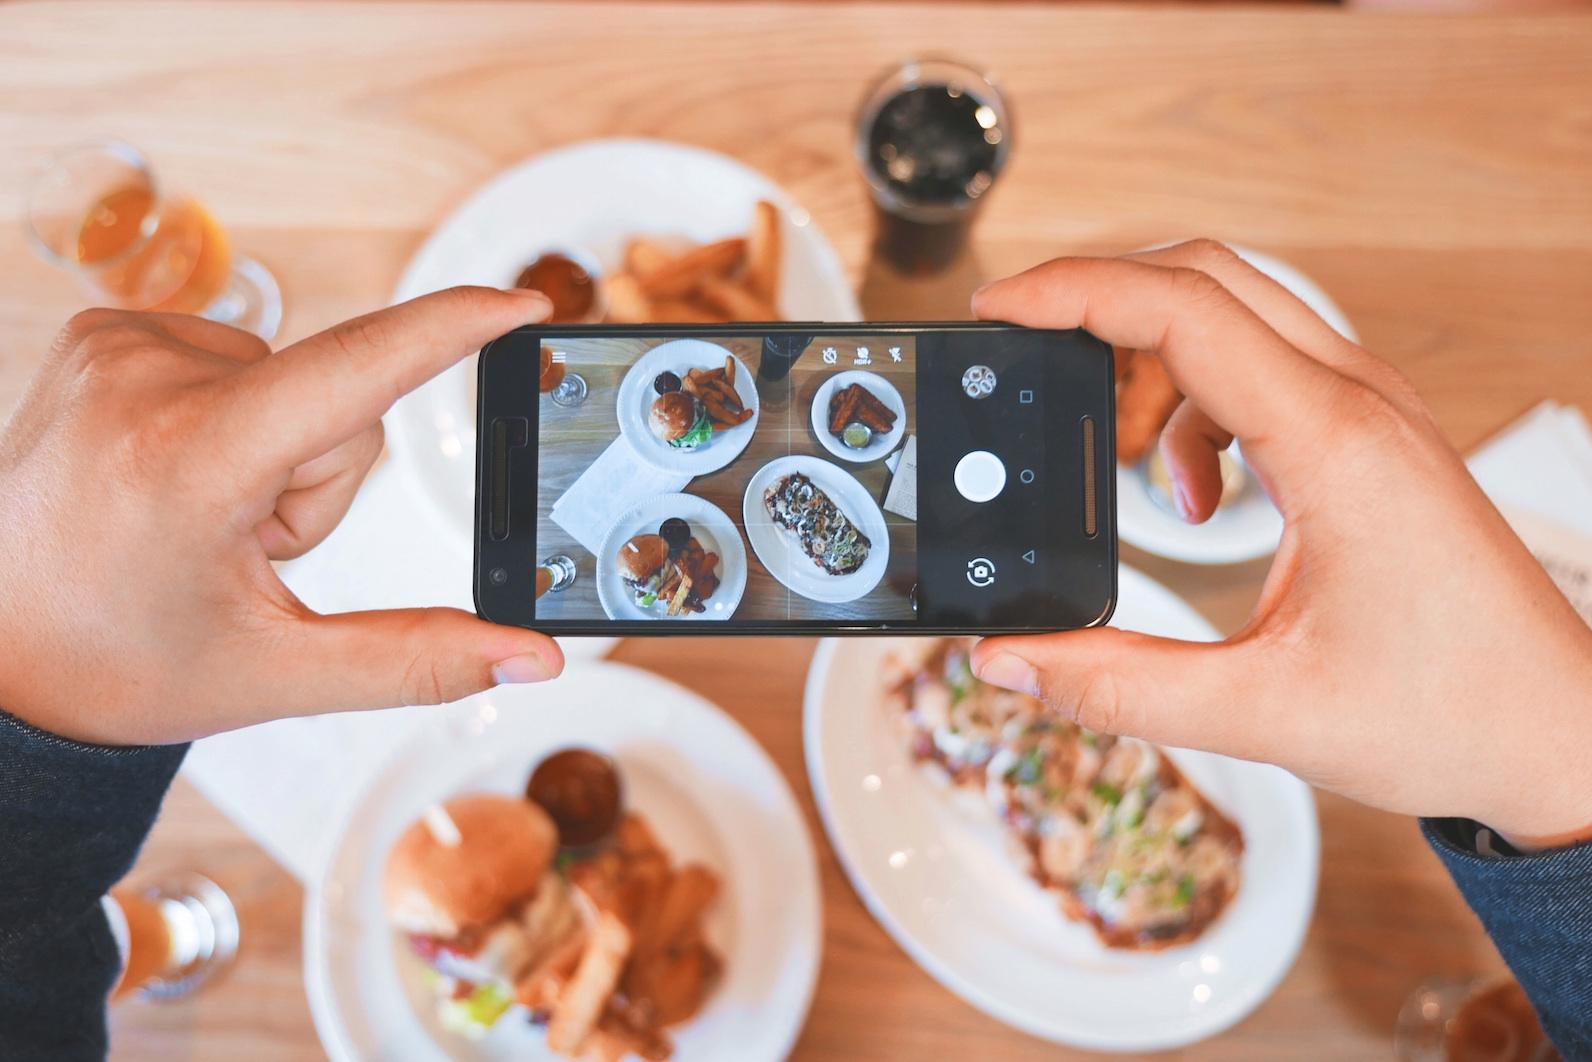 instagram-stories-perché-è-meglio-di-snapchat